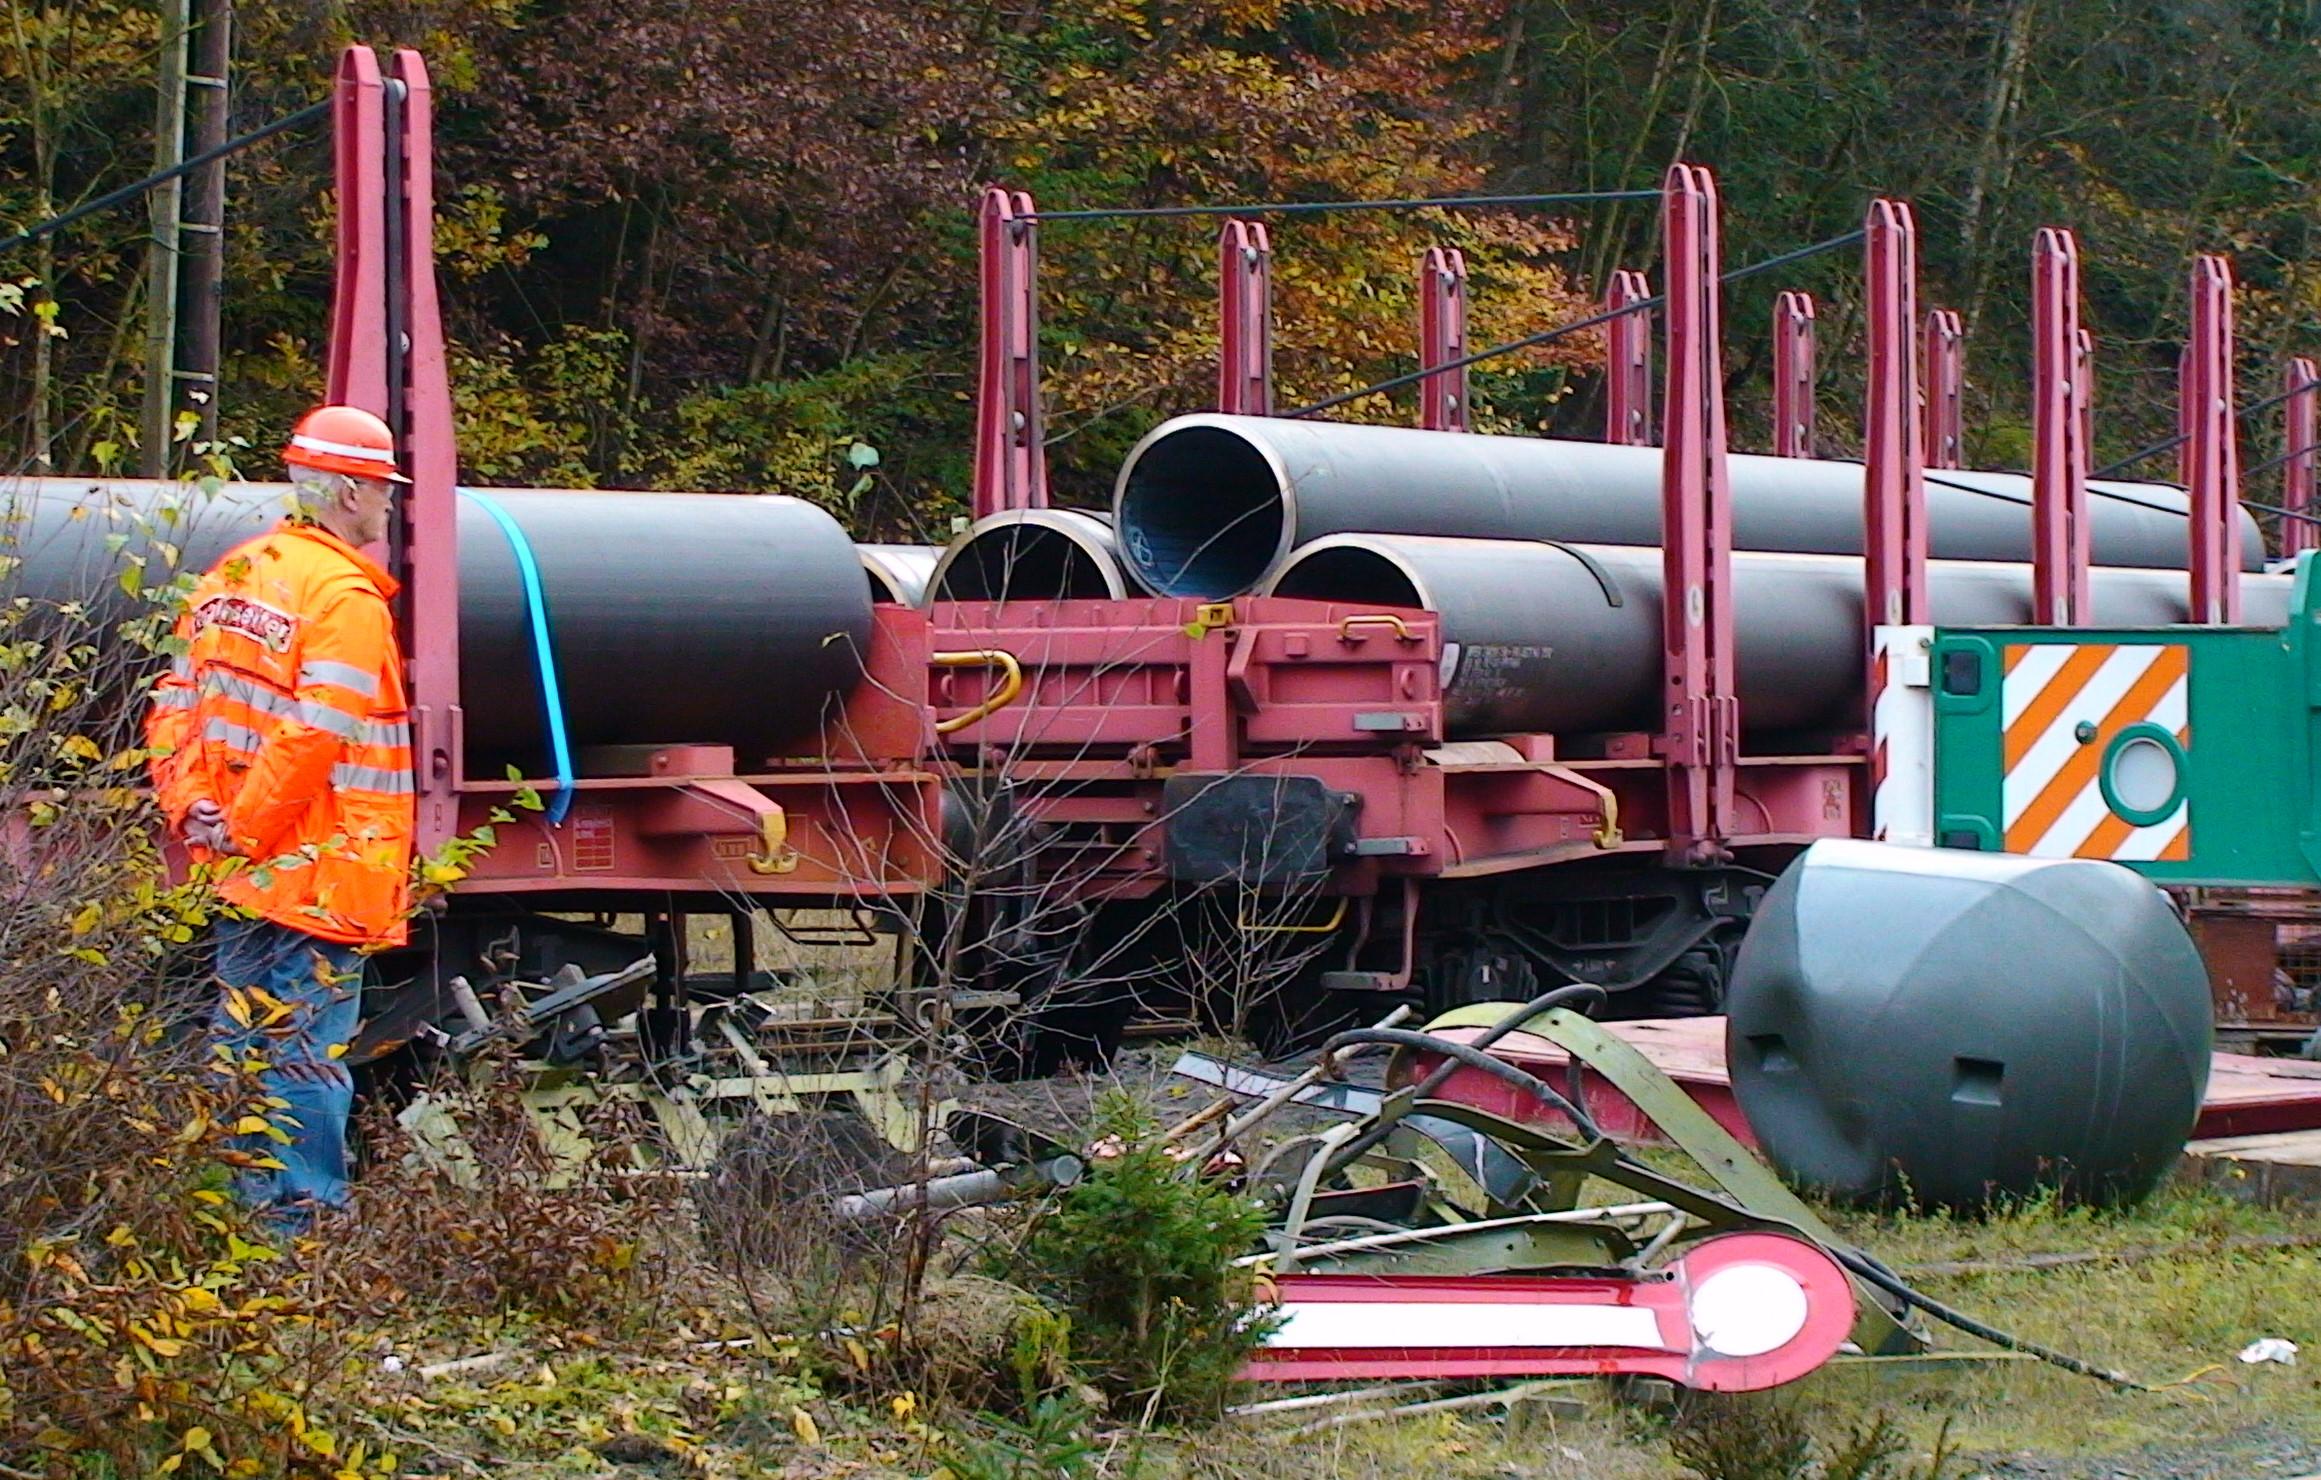 2014-10-30 Güterzug Entgleist Dahlbruch001